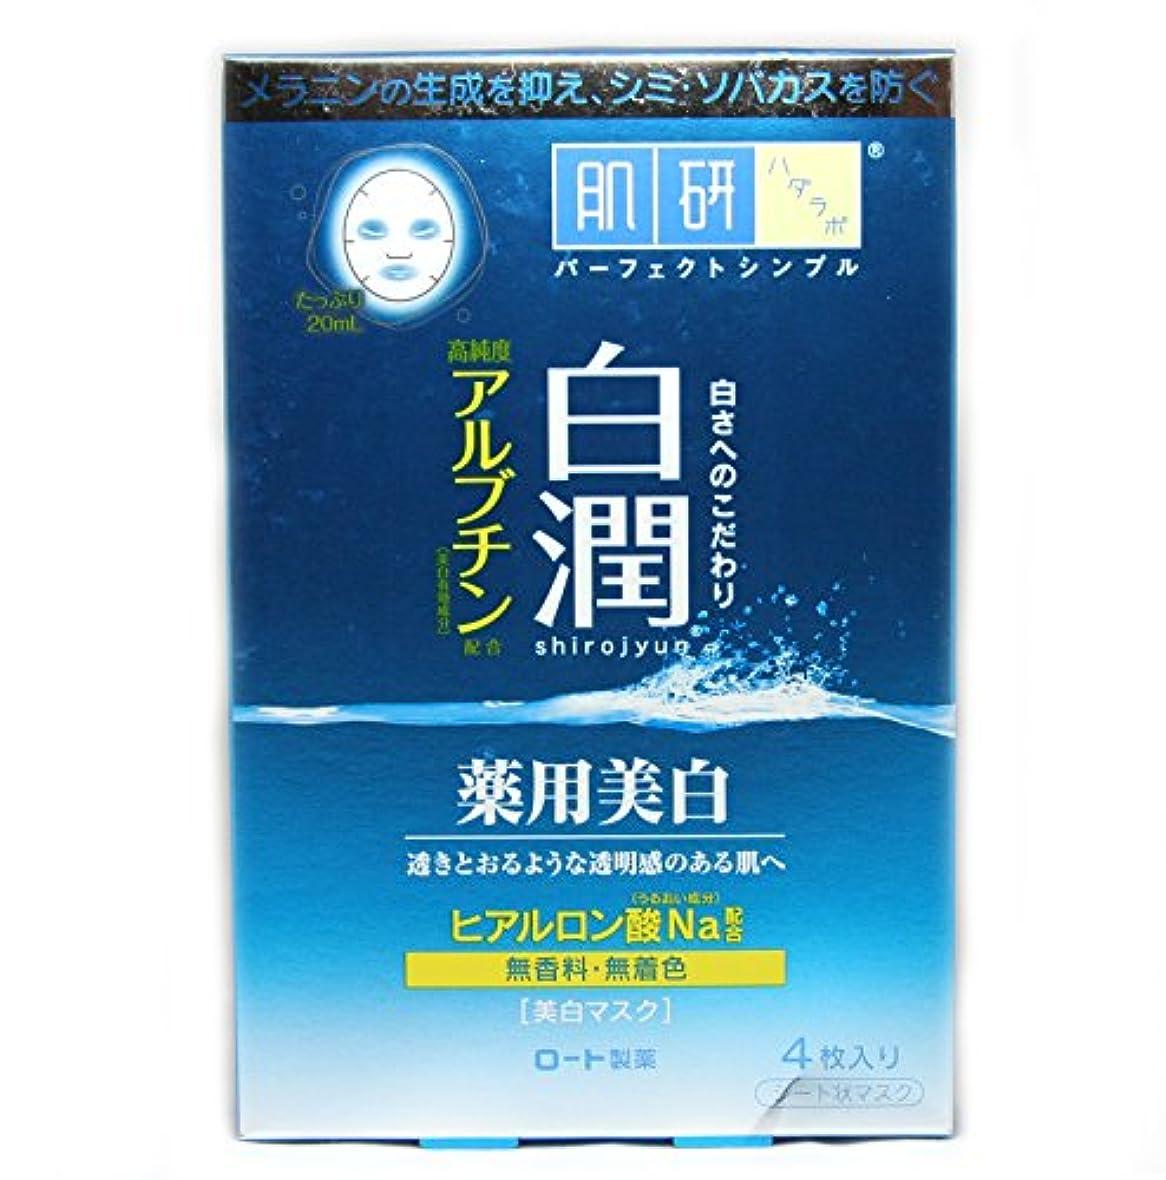 知事鳥味肌研白潤薬用美白マスク